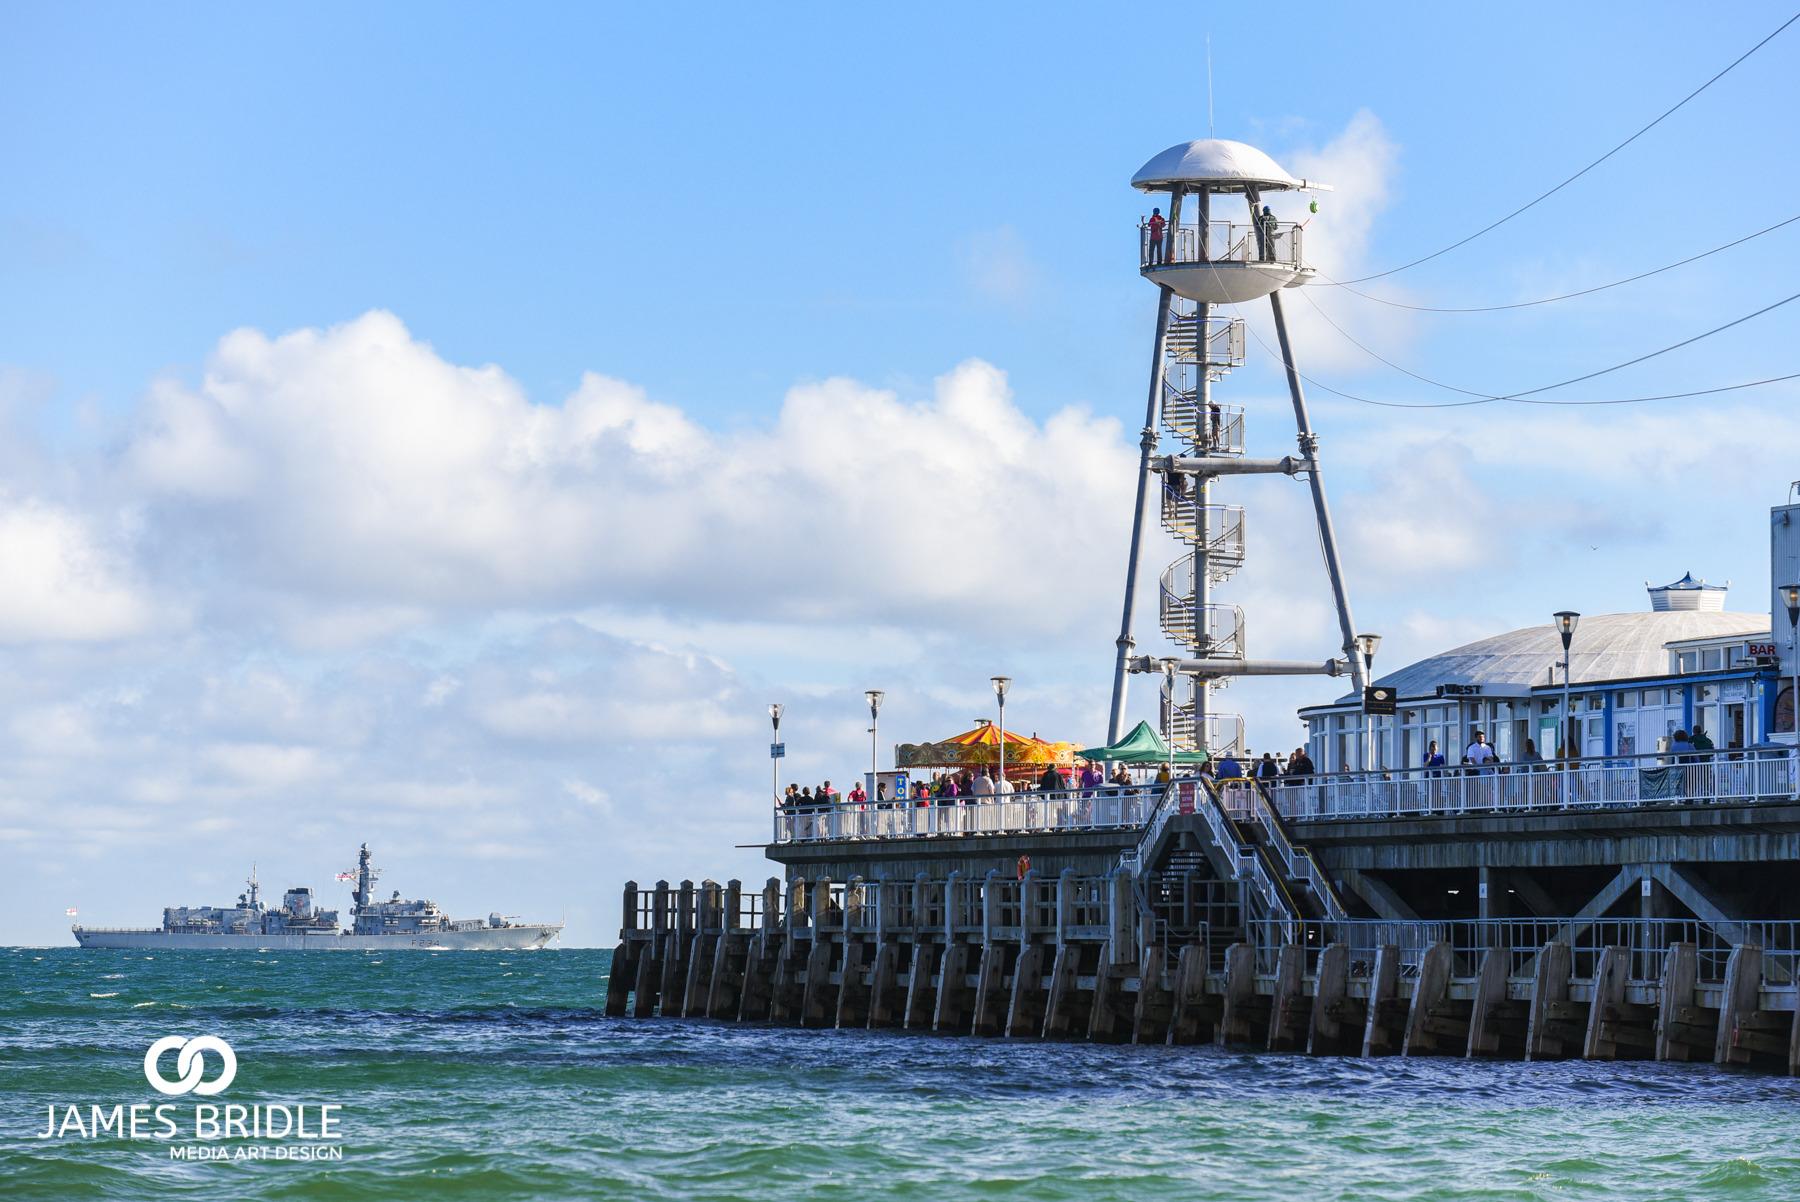 HMS Iron duke, Bournemouth airshow